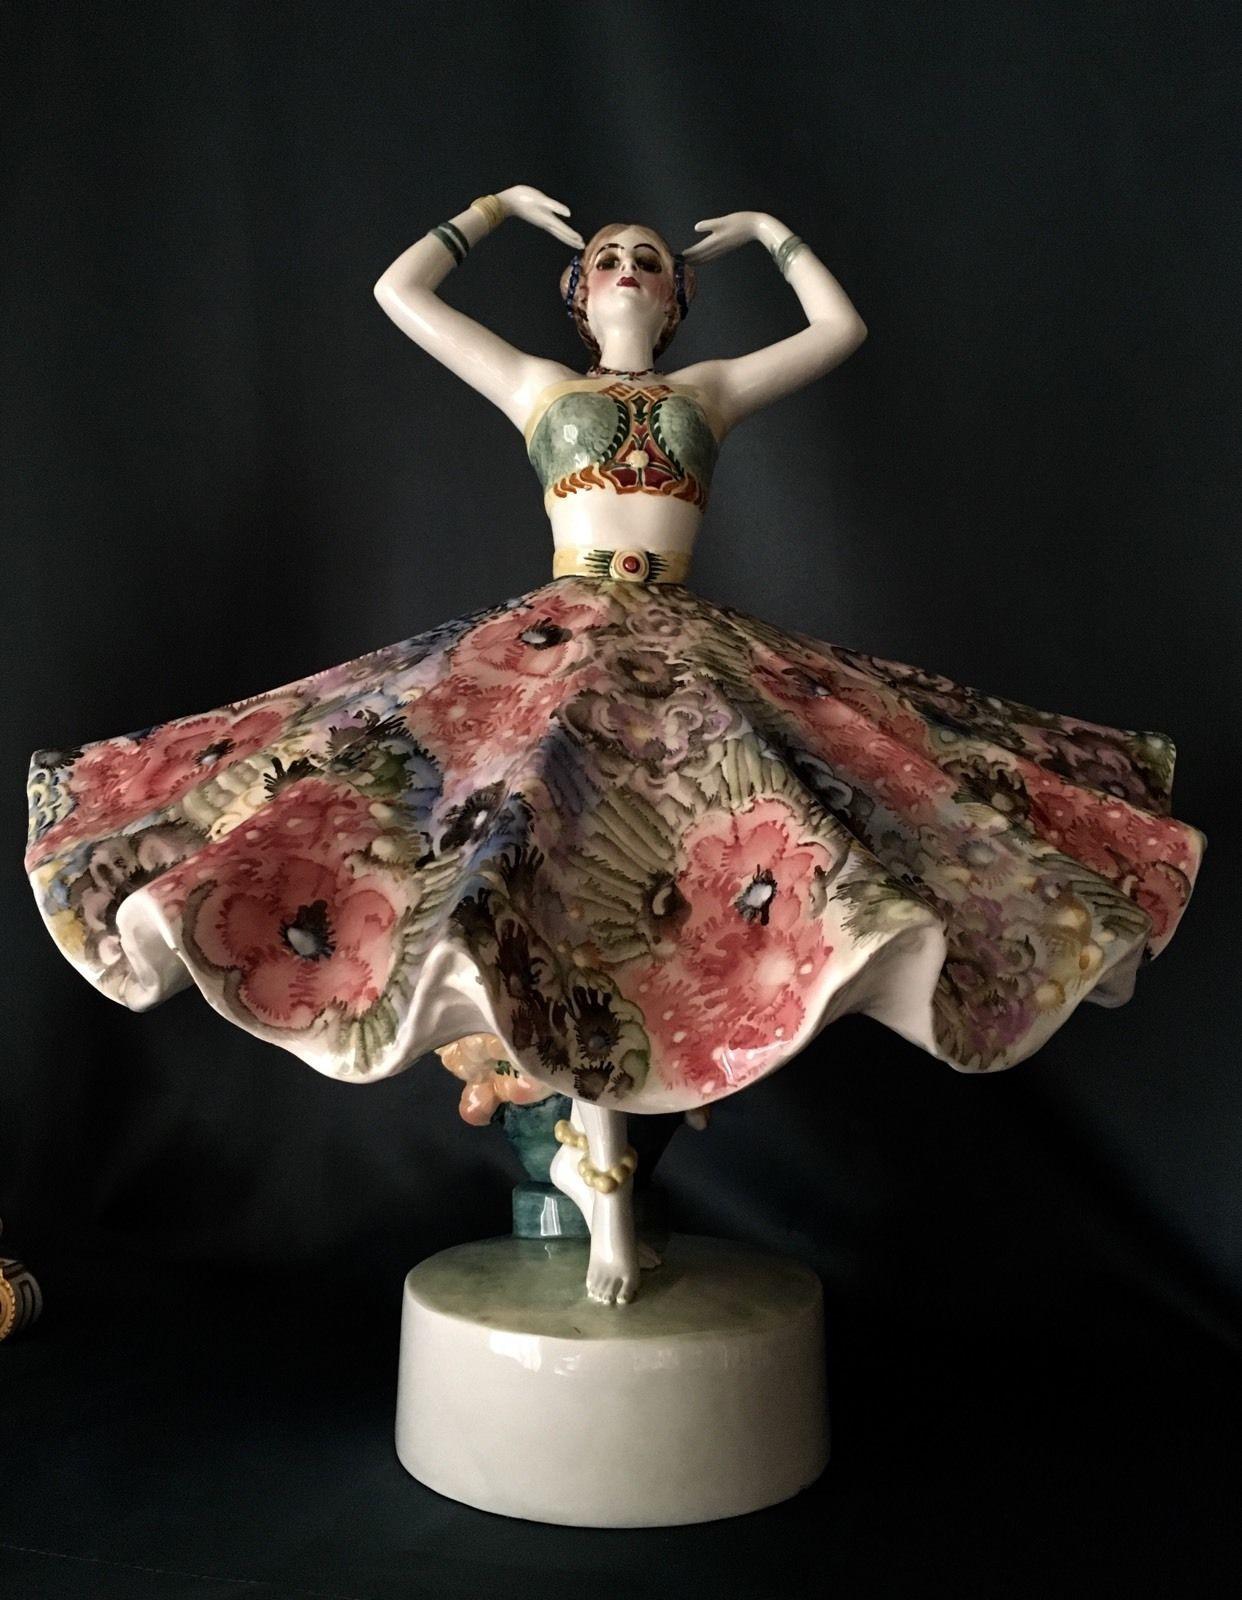 Contemporary Art Woman Lady Girl Figurine Sculpture Fashion Model Home Decor